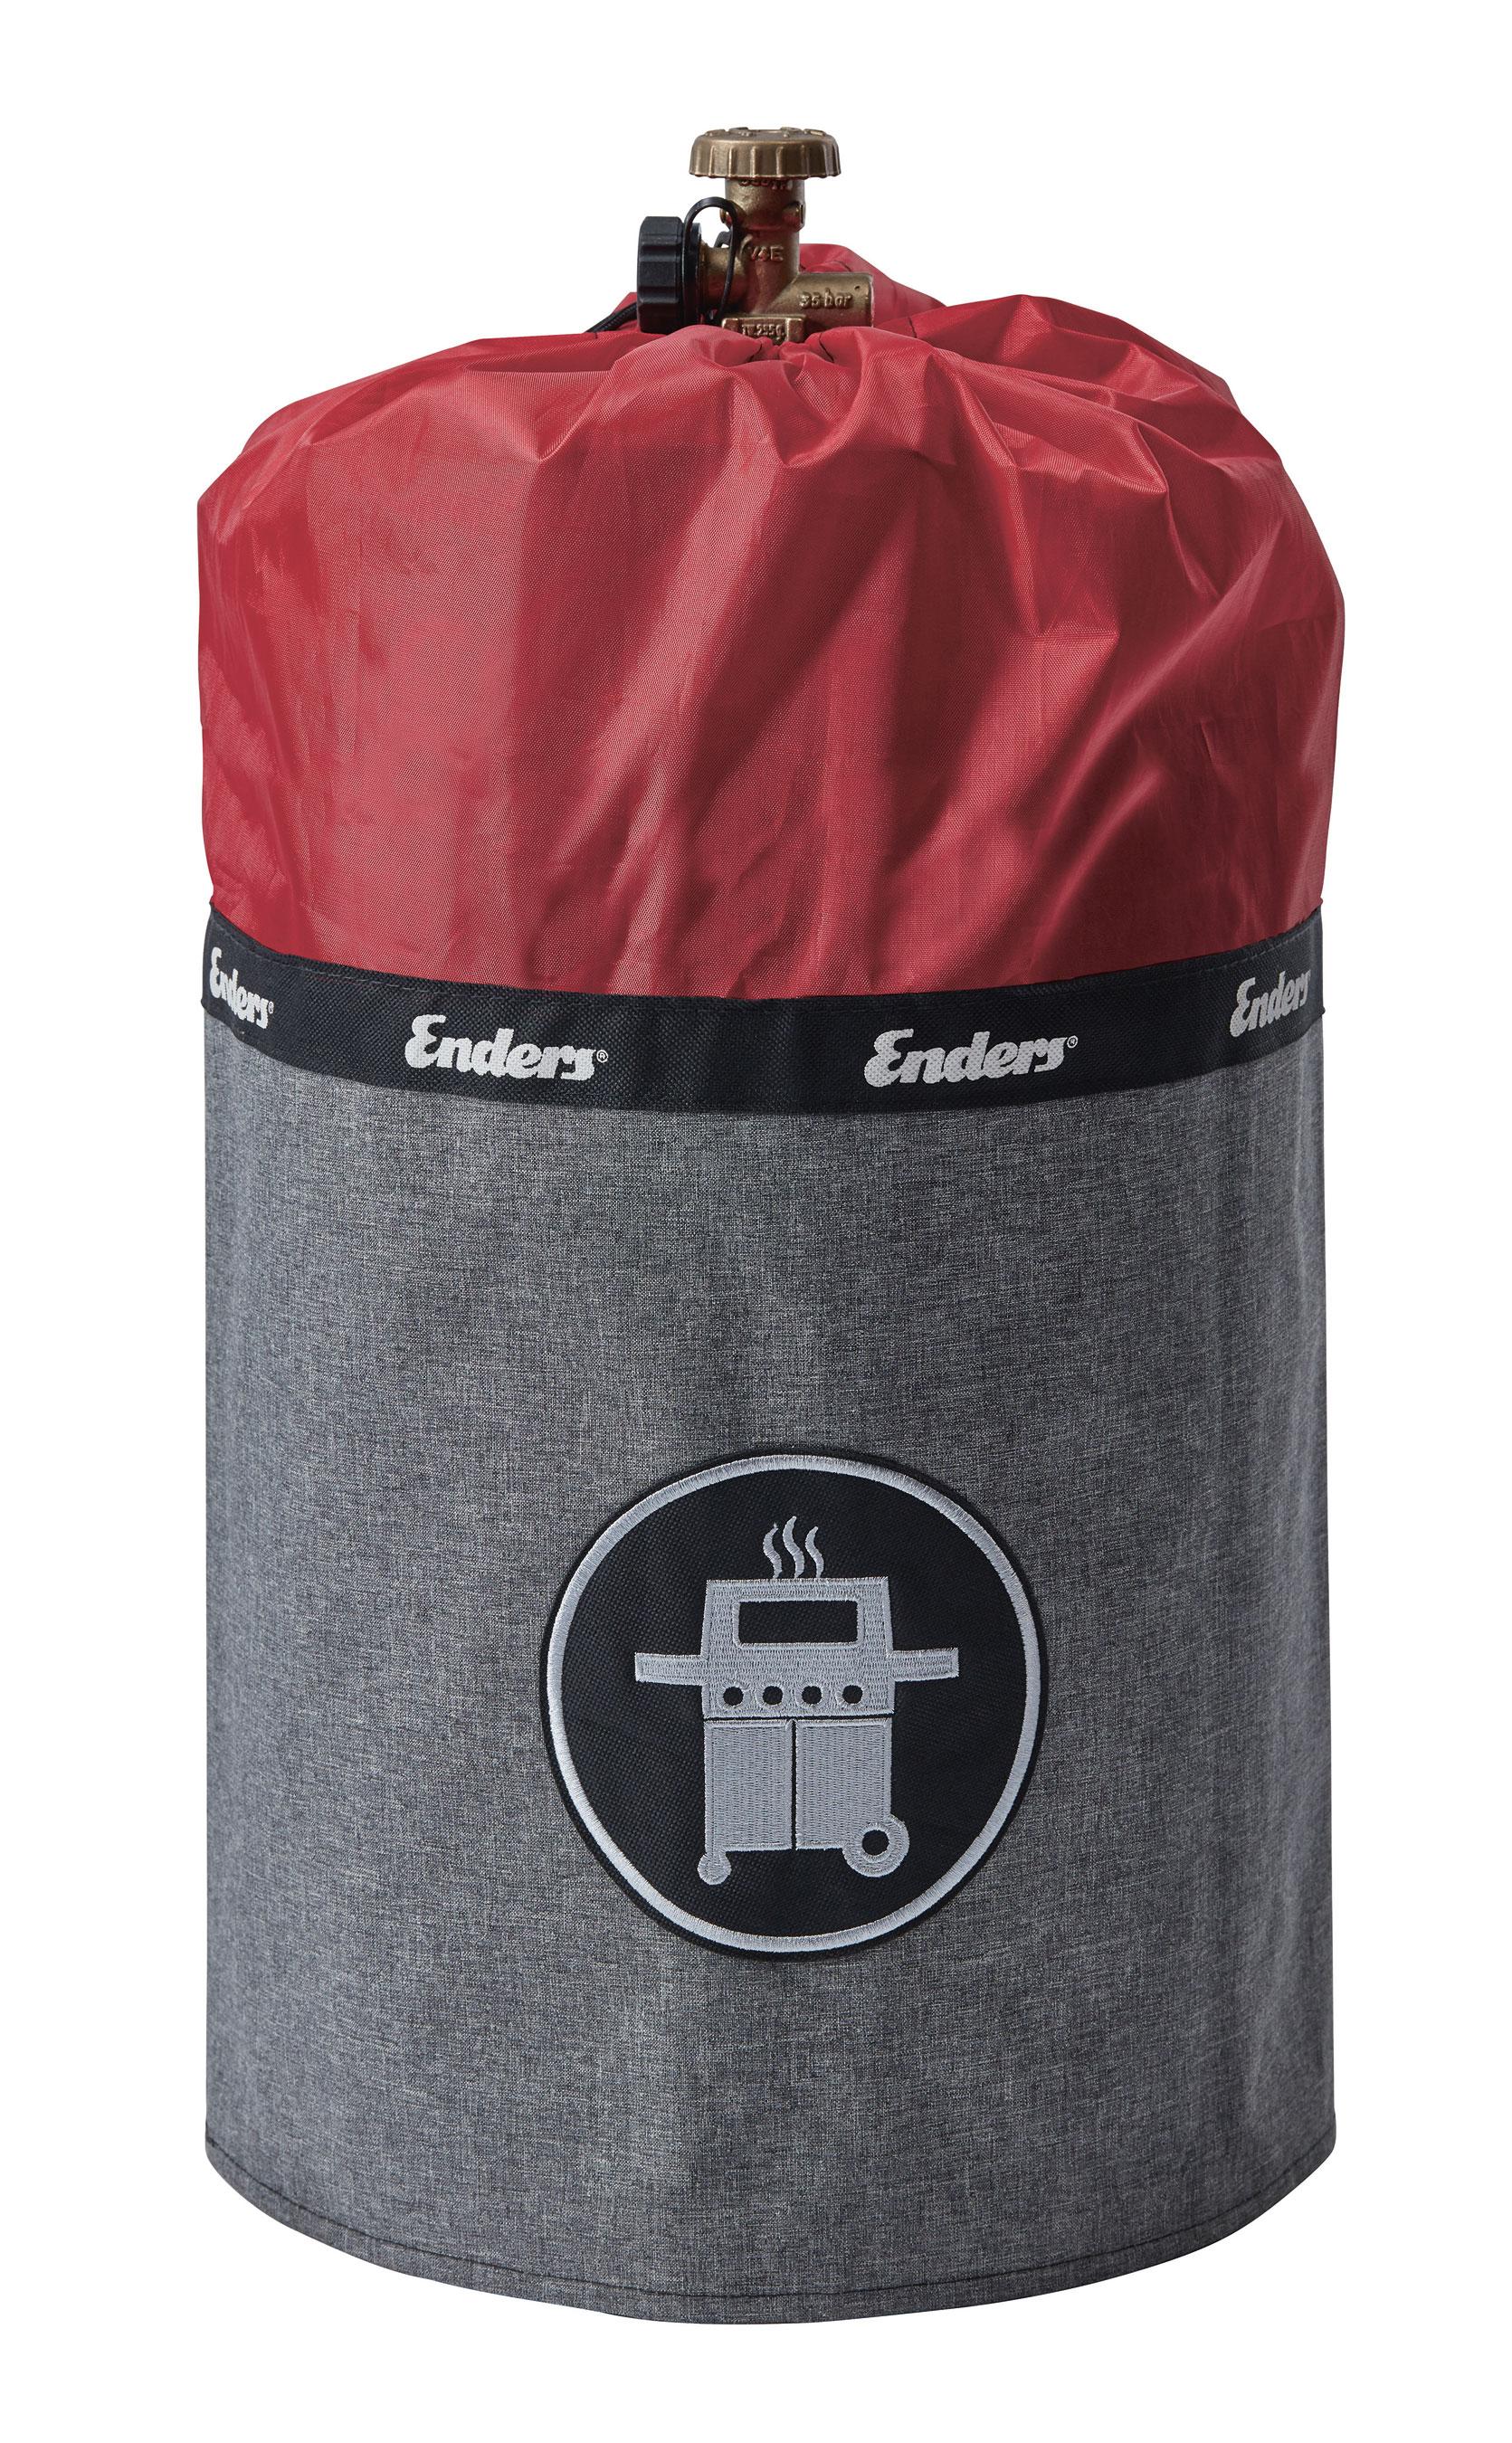 enders gasflaschenh lle style f r gasflasche 11kg red. Black Bedroom Furniture Sets. Home Design Ideas